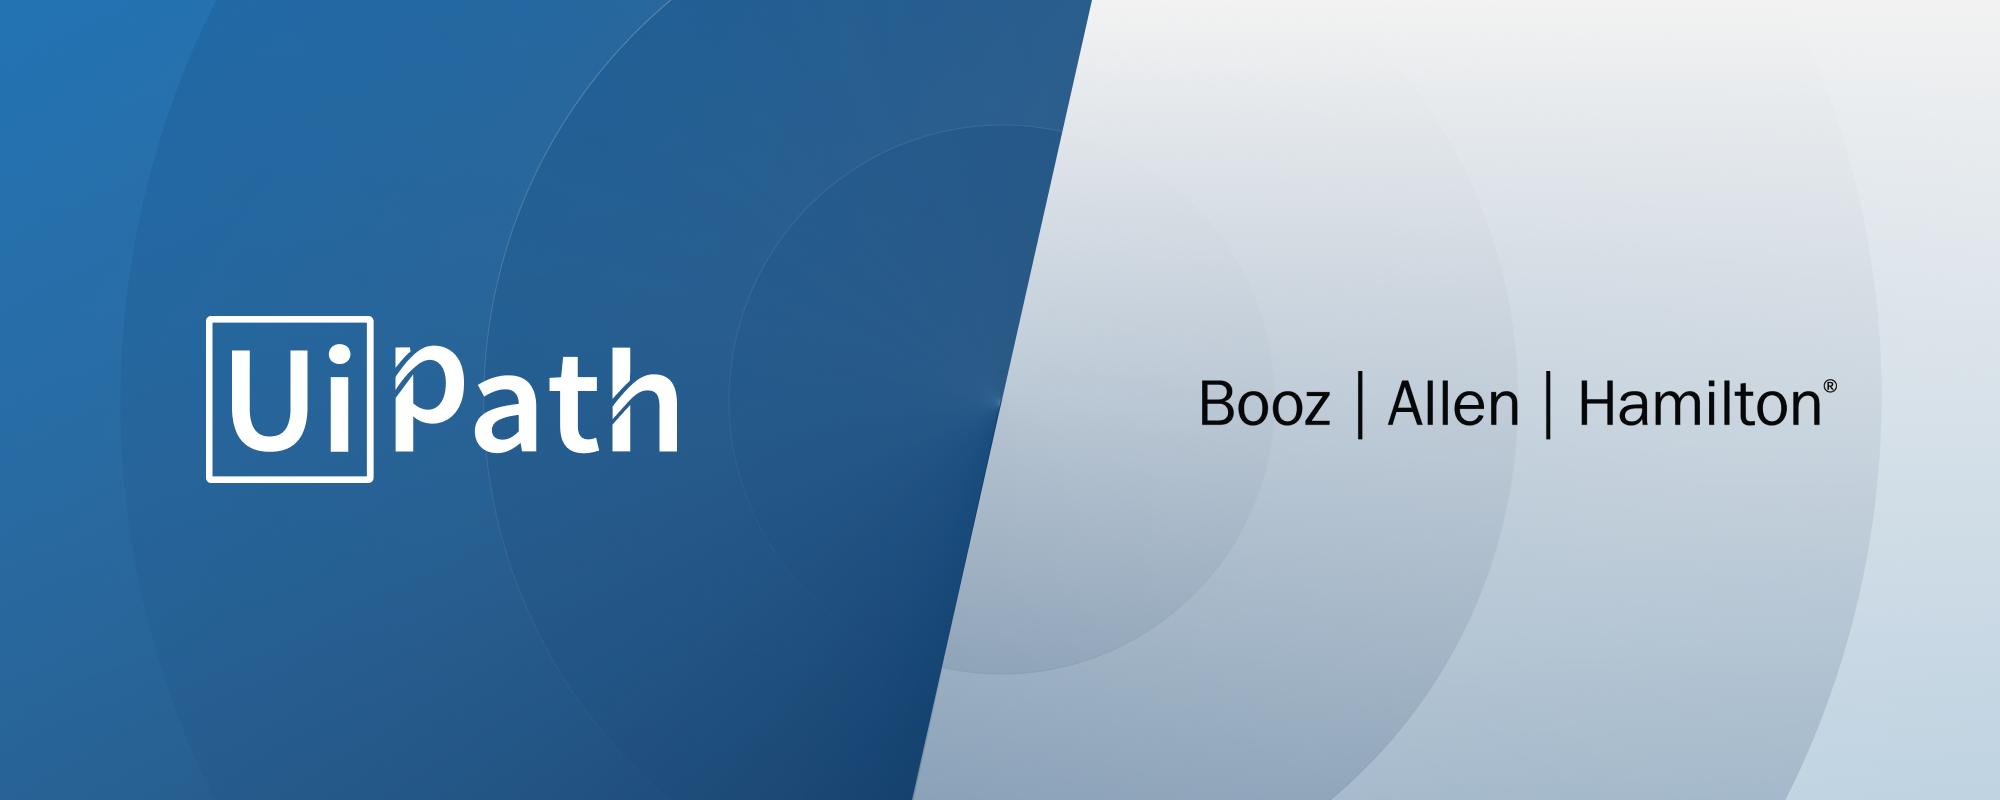 UiPath and Booz Allen Hamilton Partner to Drive Process Efficiencies in the Public Sector